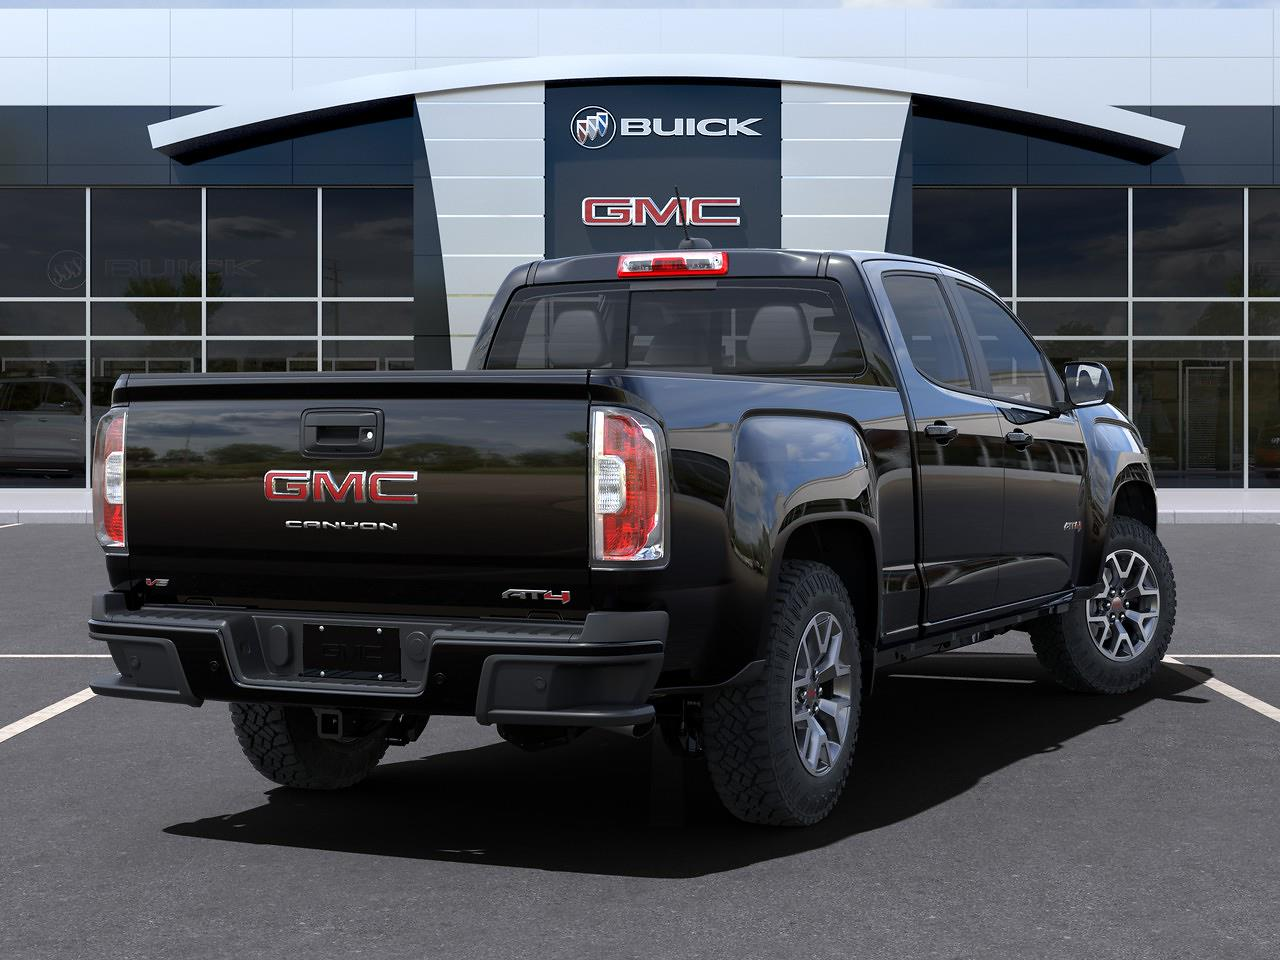 2021 GMC Canyon Crew Cab 4x4, Pickup #272109 - photo 2